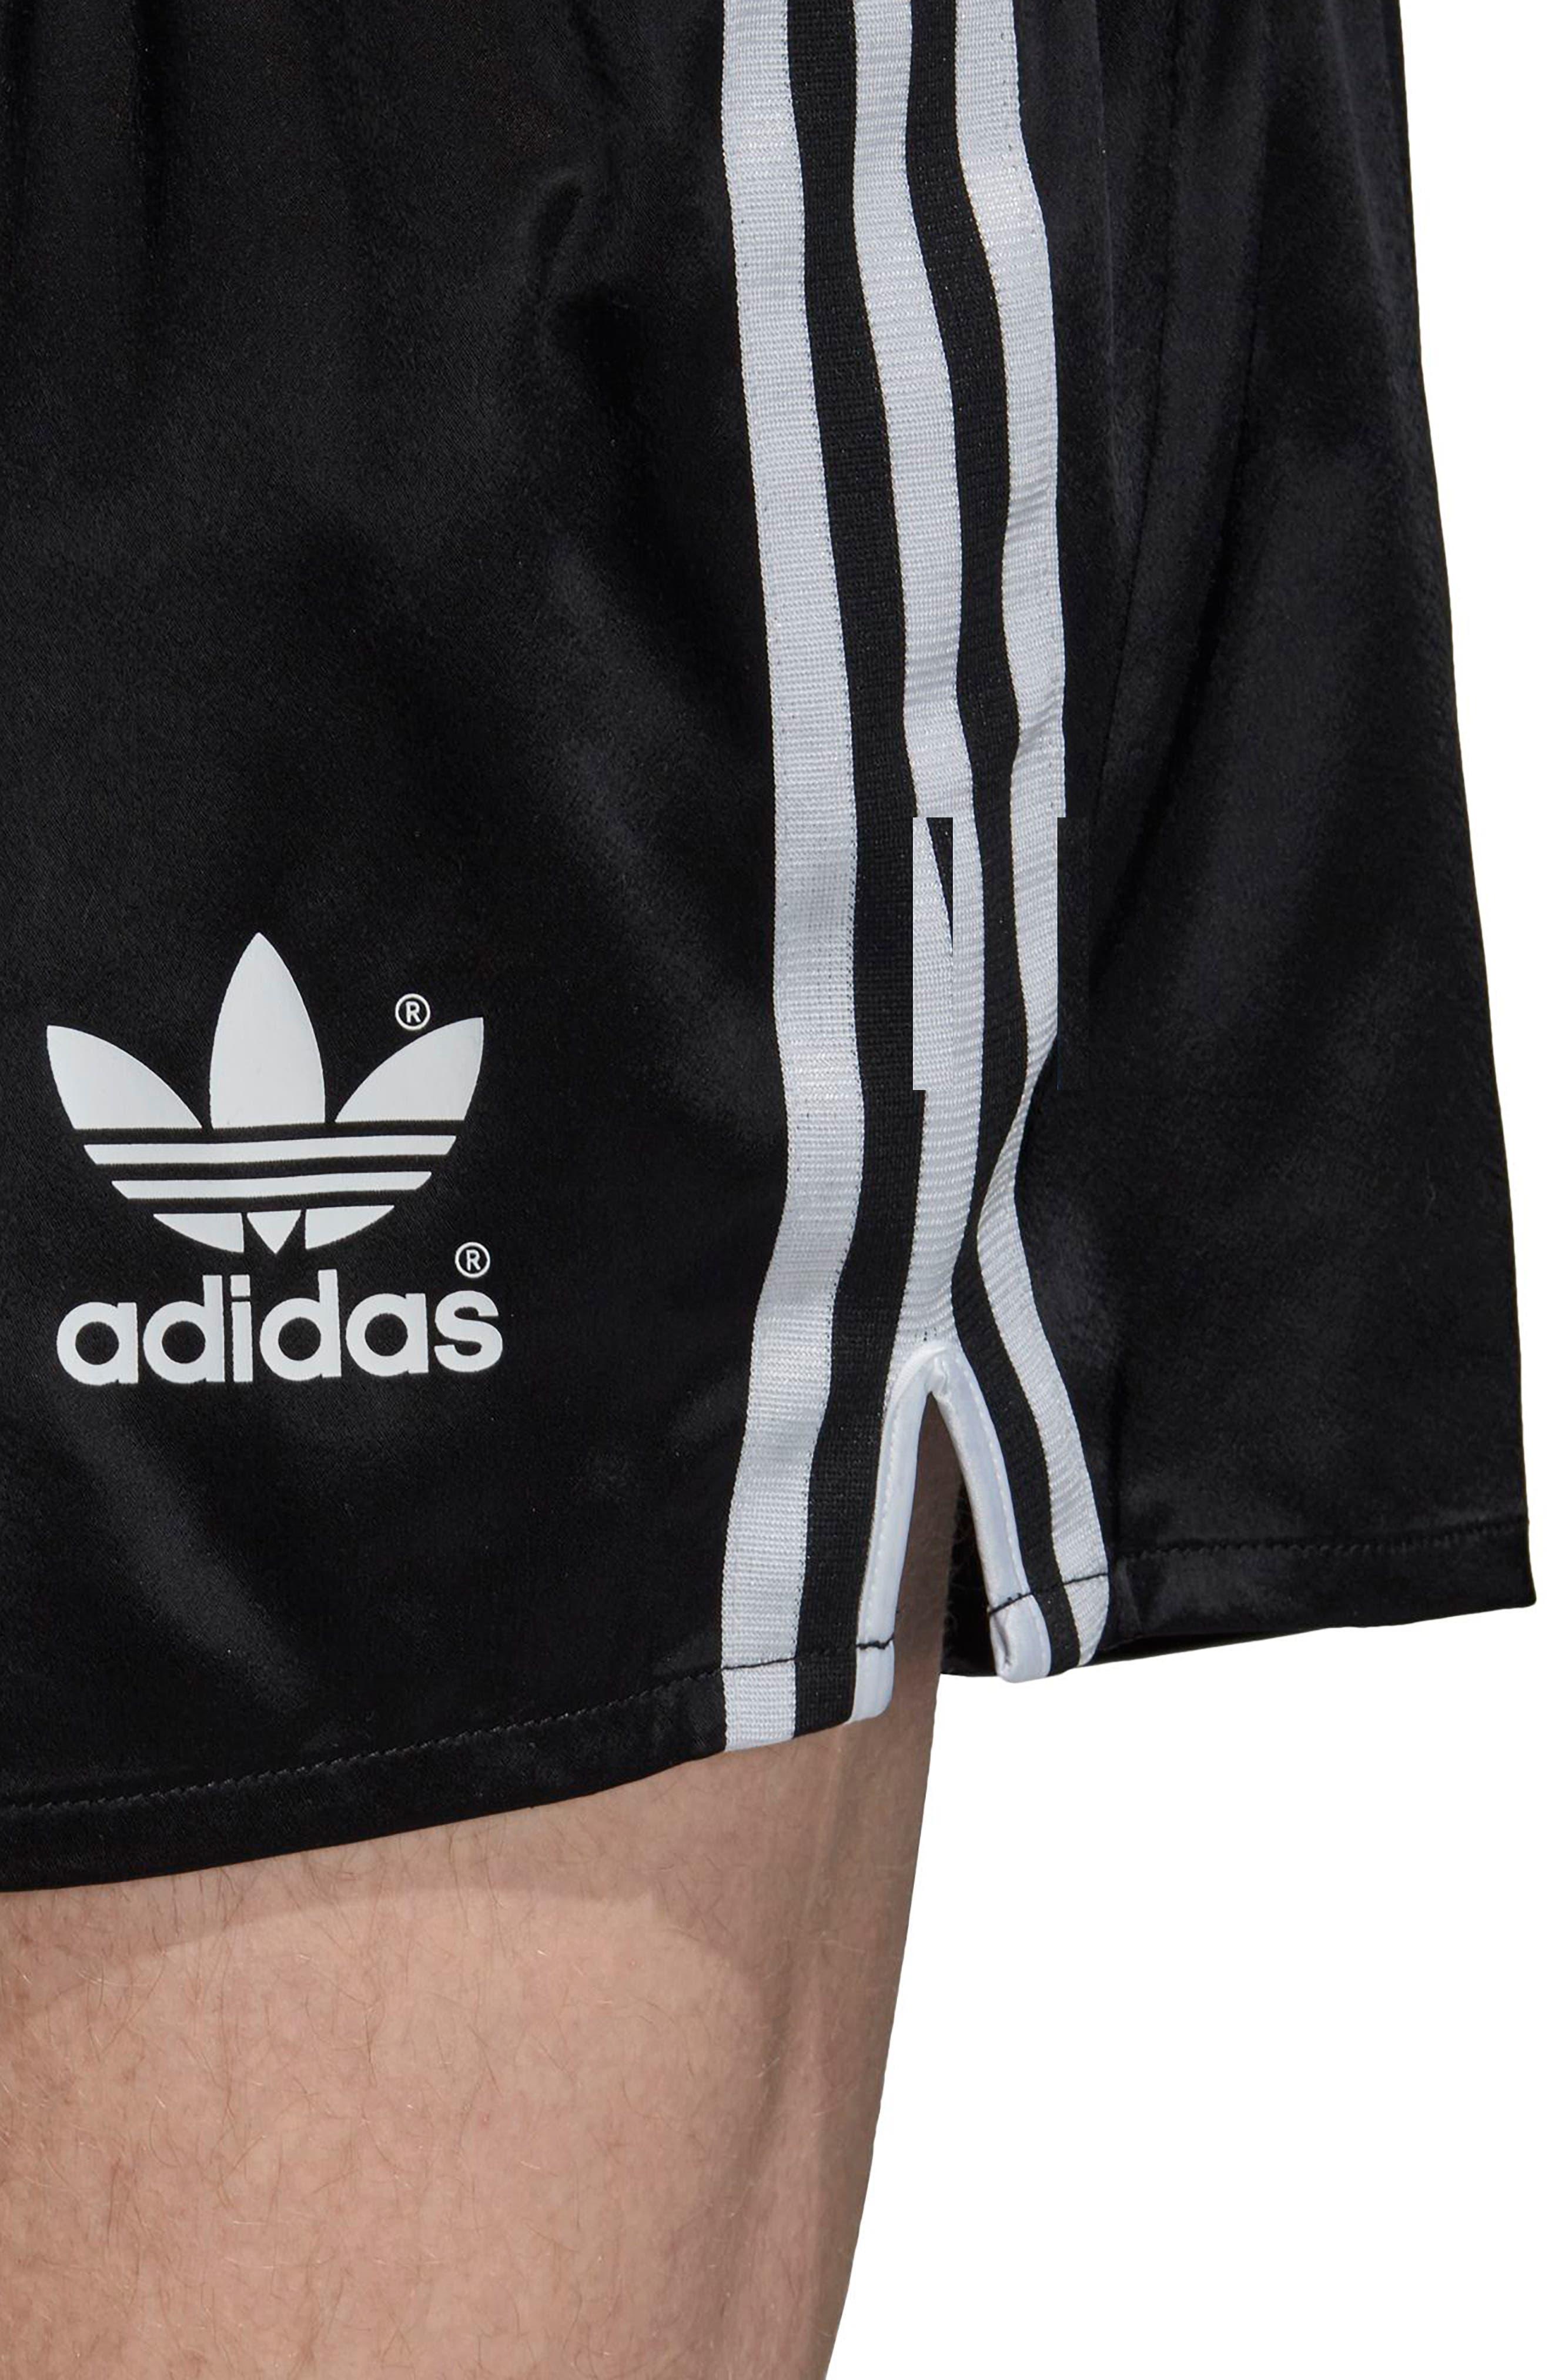 adidas Original Argentina 1987 Shorts,                             Alternate thumbnail 5, color,                             Black